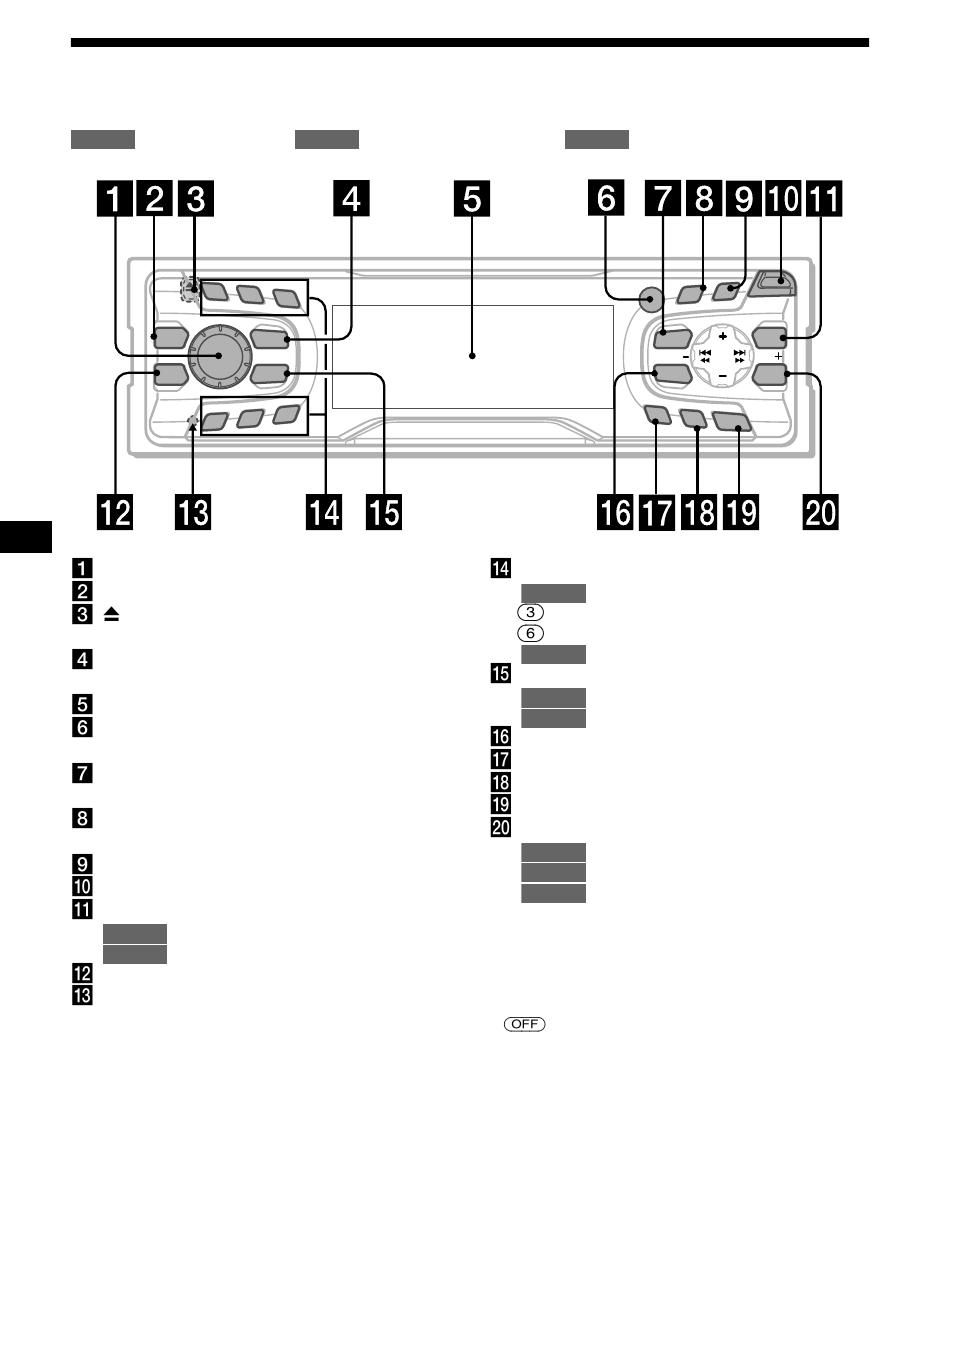 sony cdx ca650x wiring diagram delco generator schematic location of controls 4location user pinout